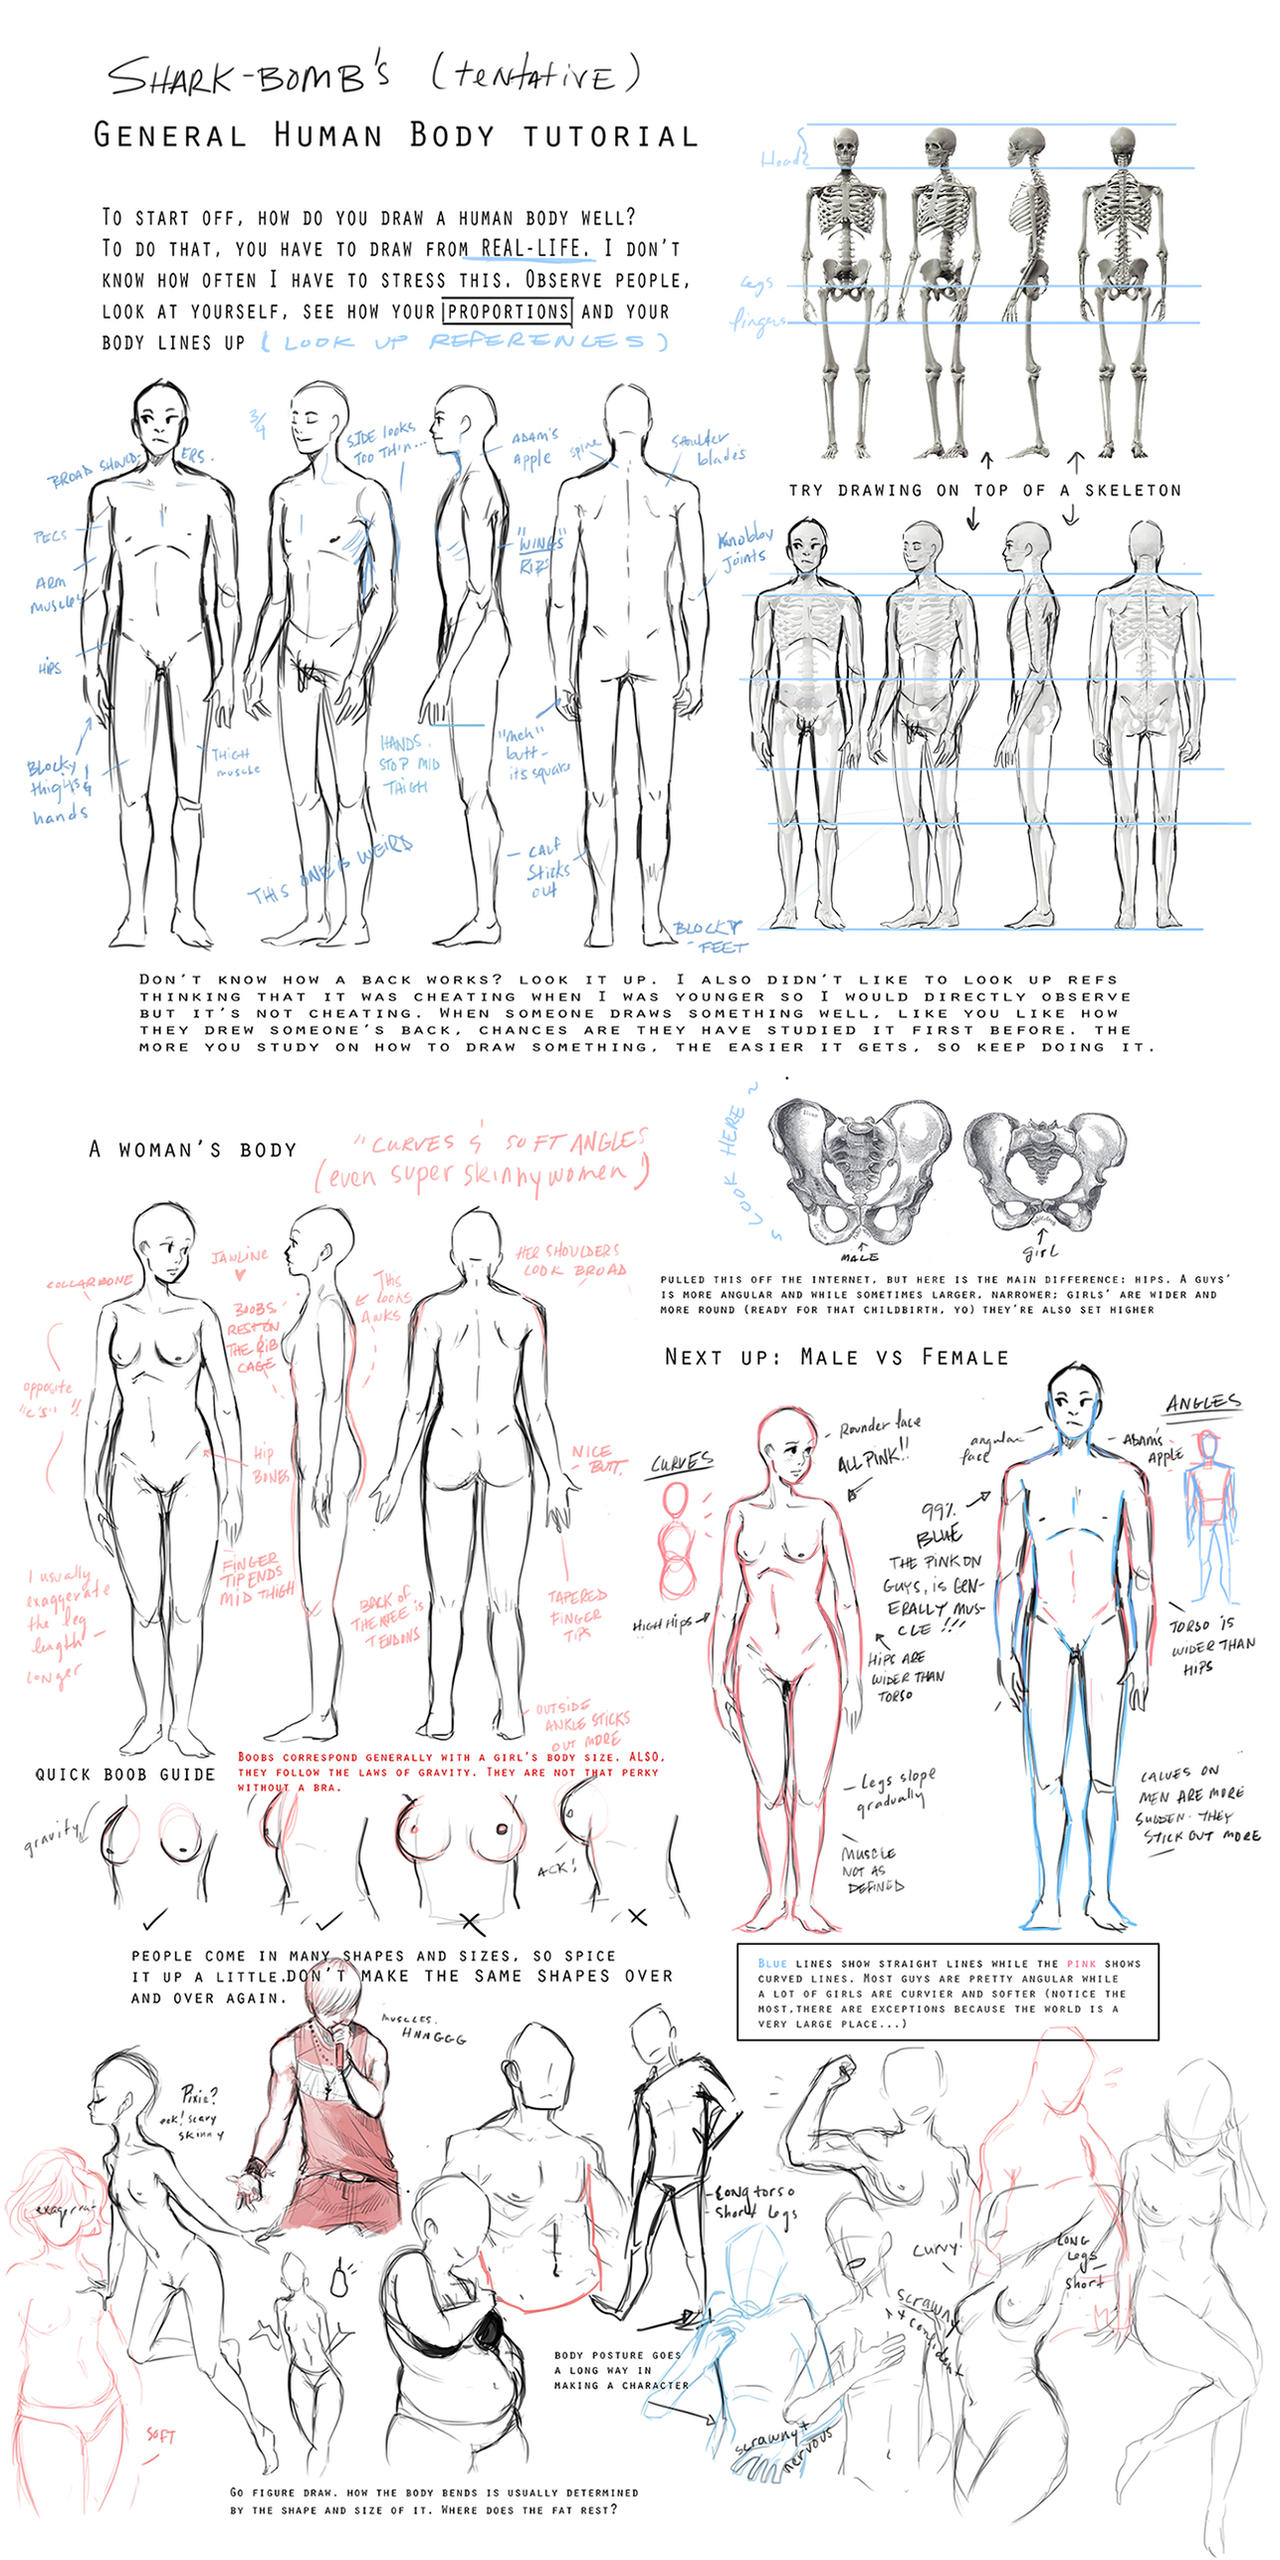 Nuevo diseño de Eilen General_body_tutorial_by_shark_bomb-d5rc5k0